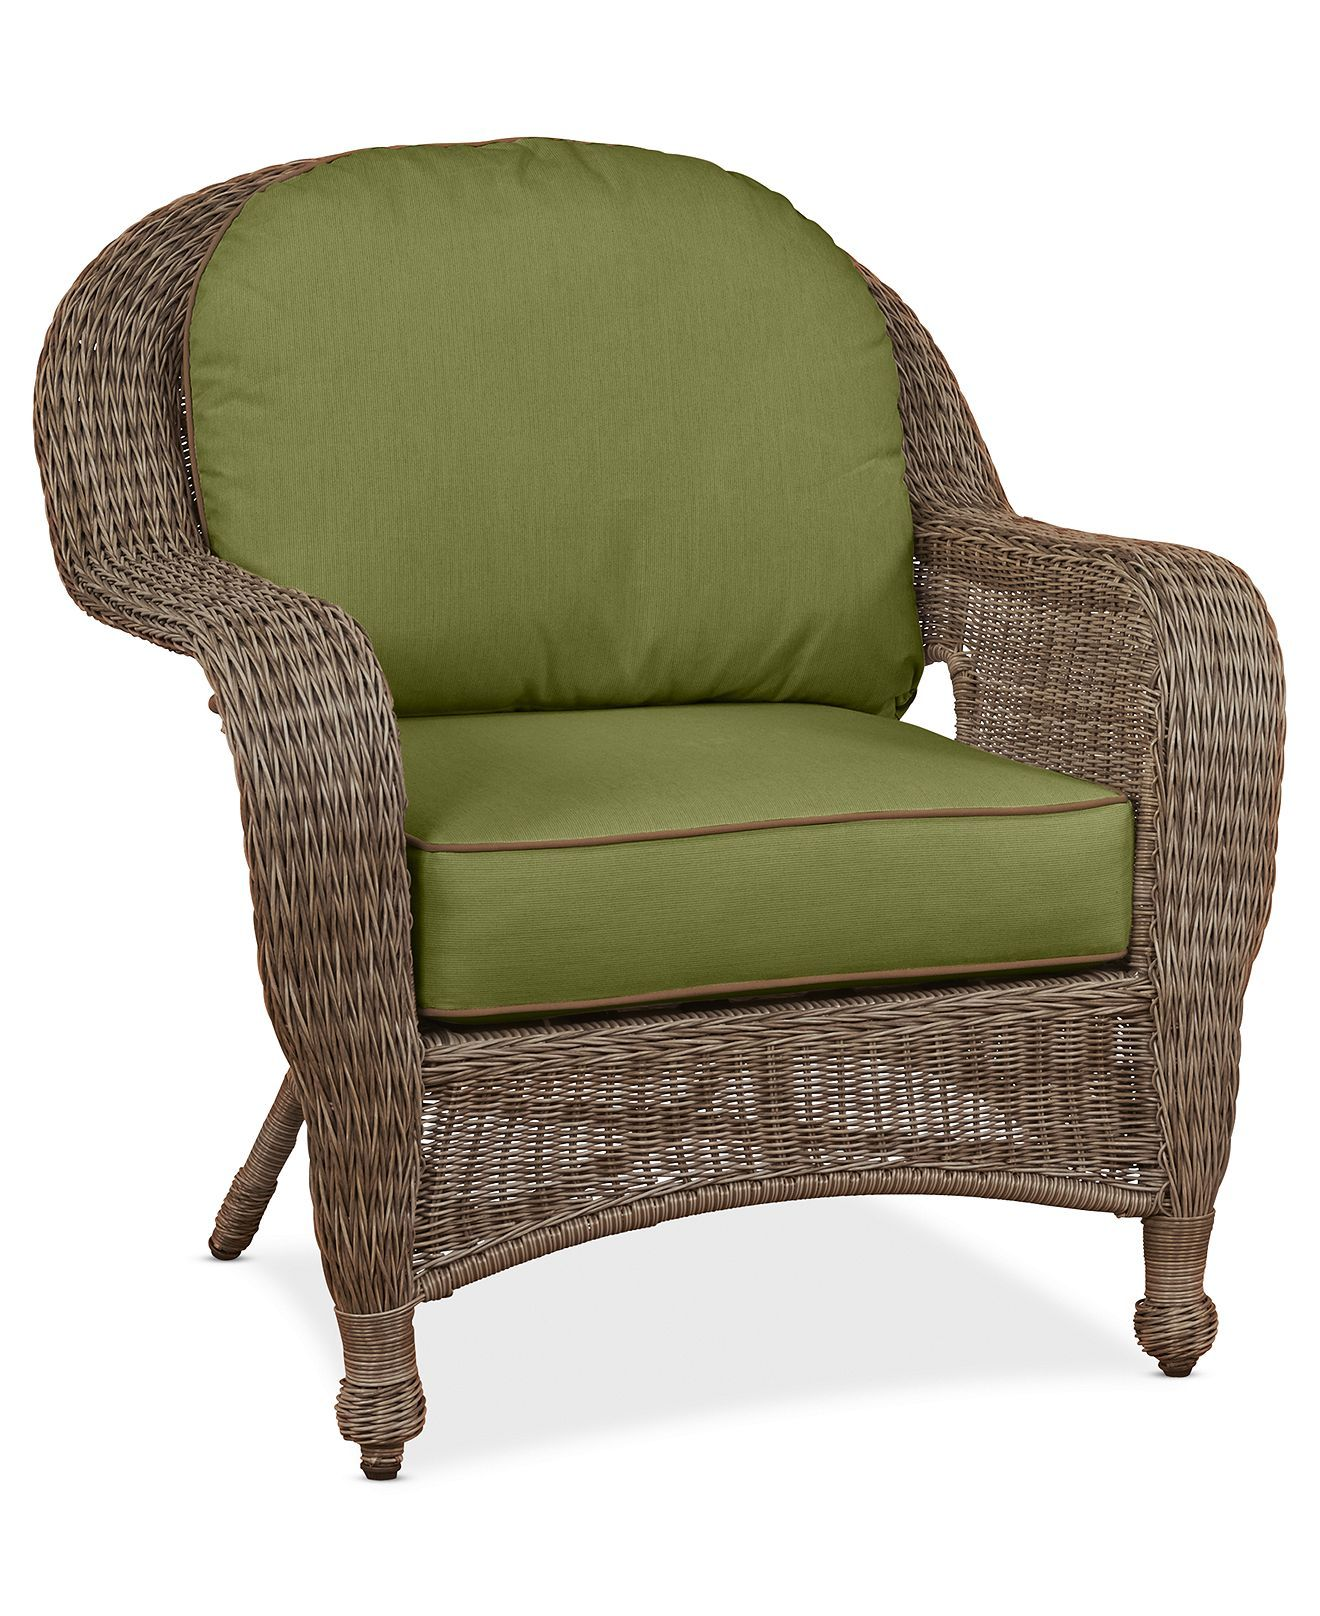 sandy cove wicker outdoor club chair: custom sunbrella®, created for